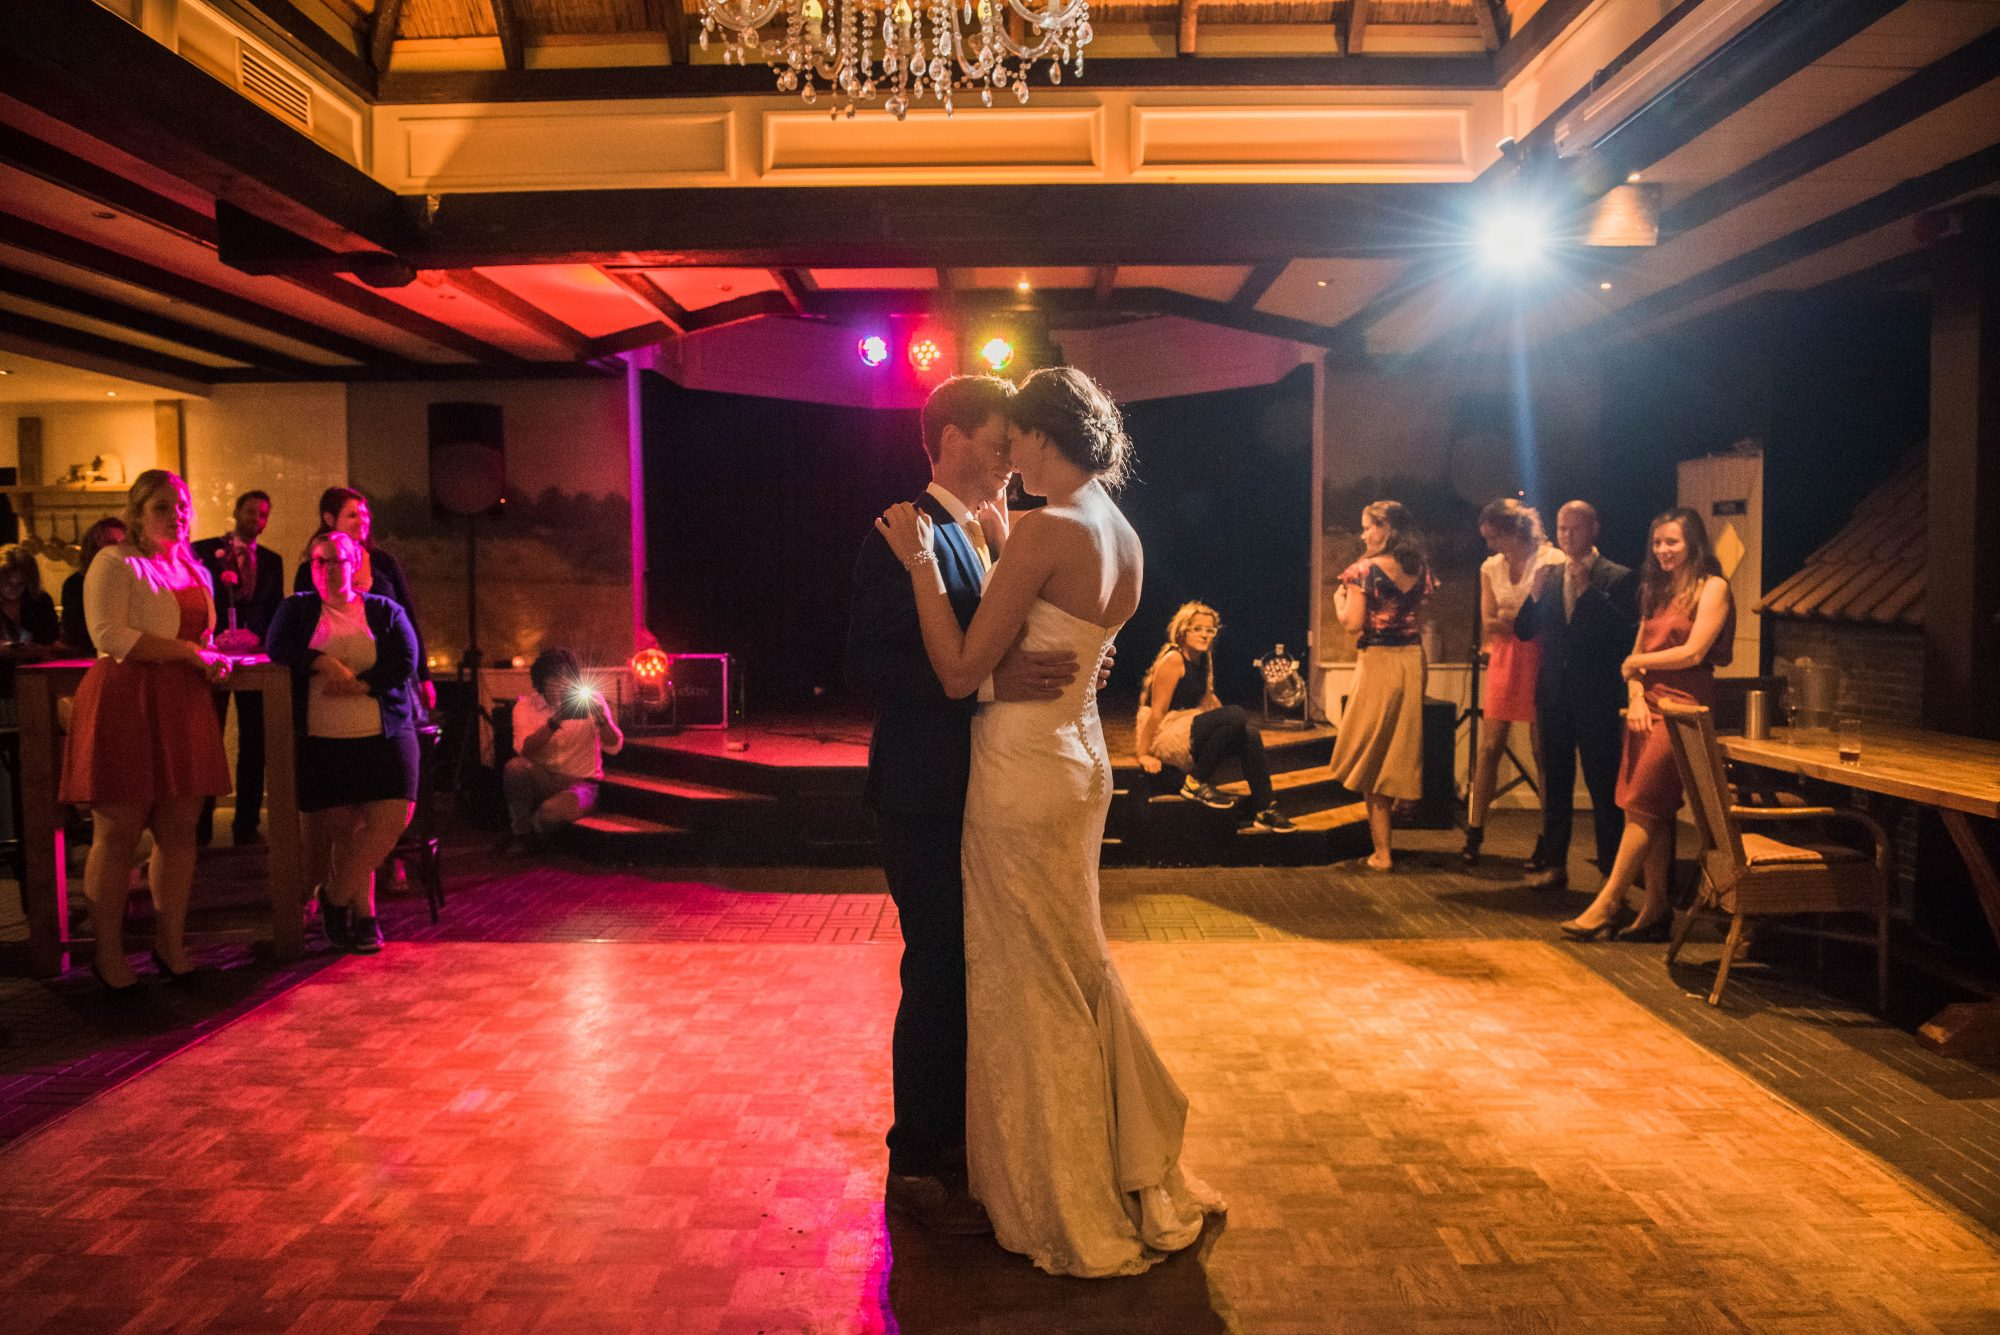 bruiloft-roland-annewil-838